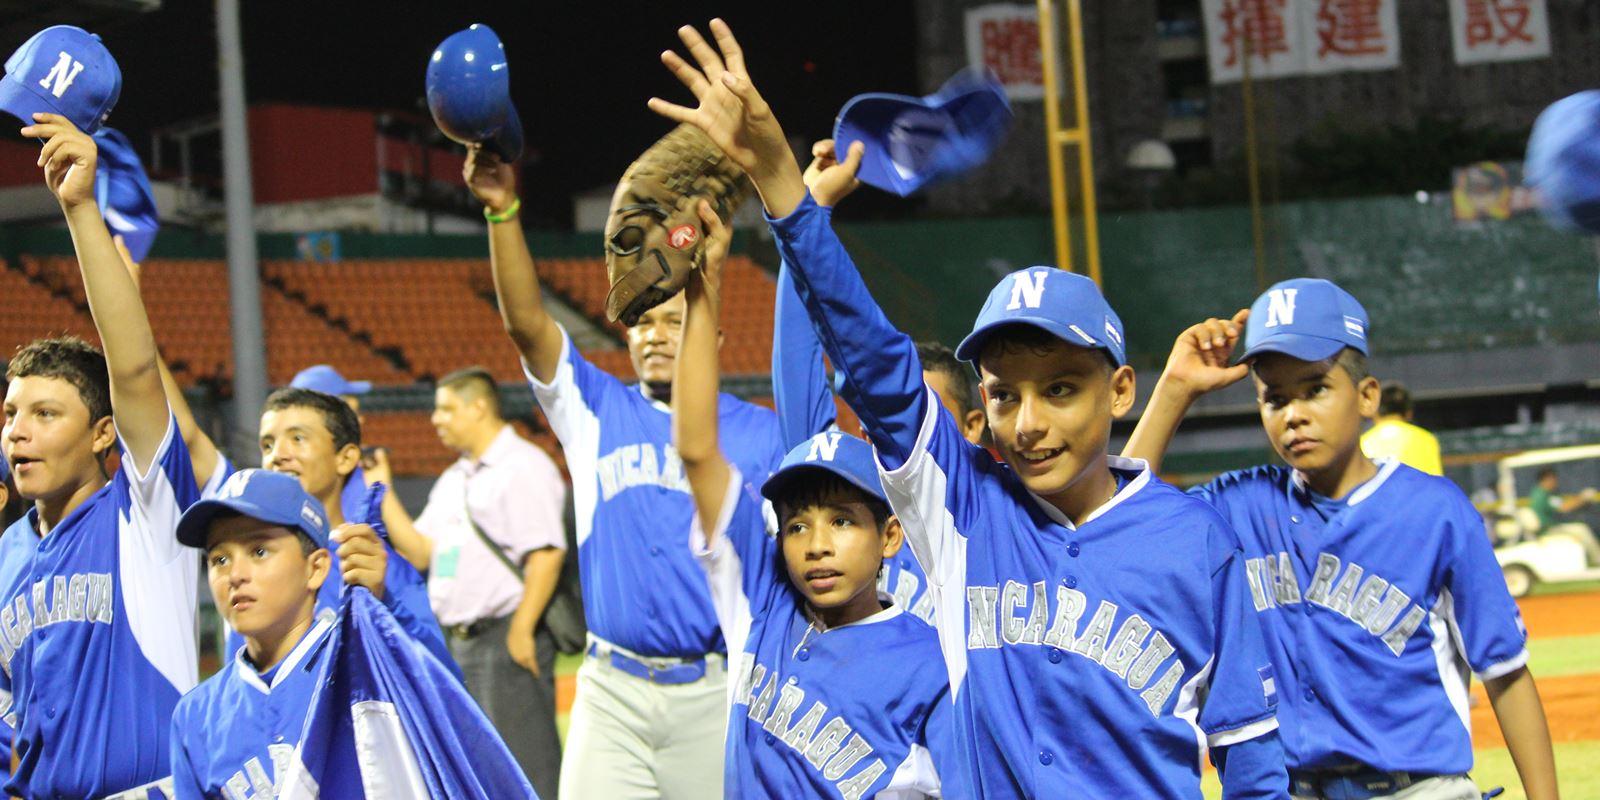 nicaragua-u12-baseball-world cup-2015